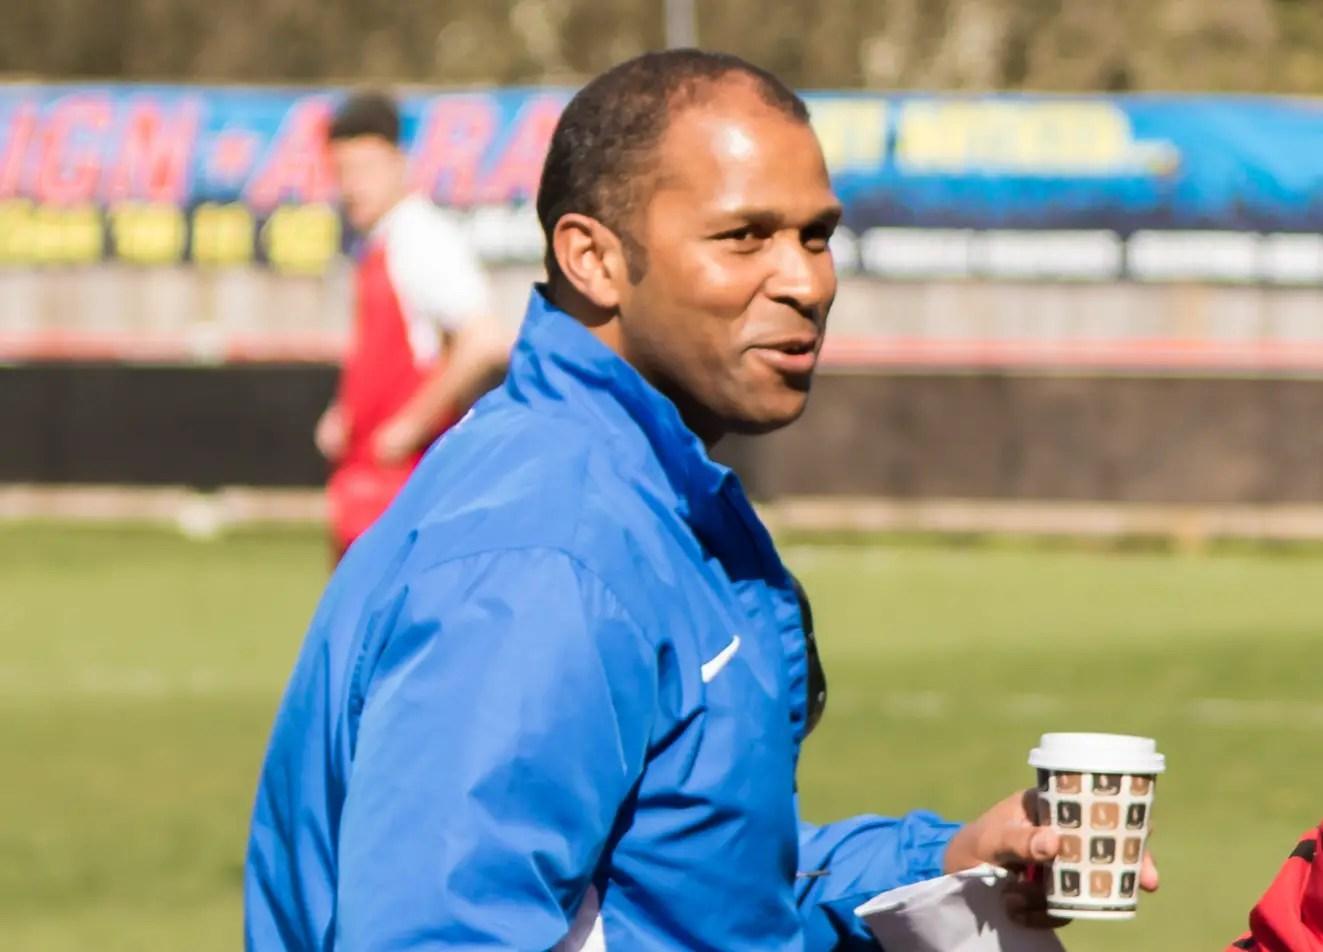 Keith Pennicott-Bowen back in senior football